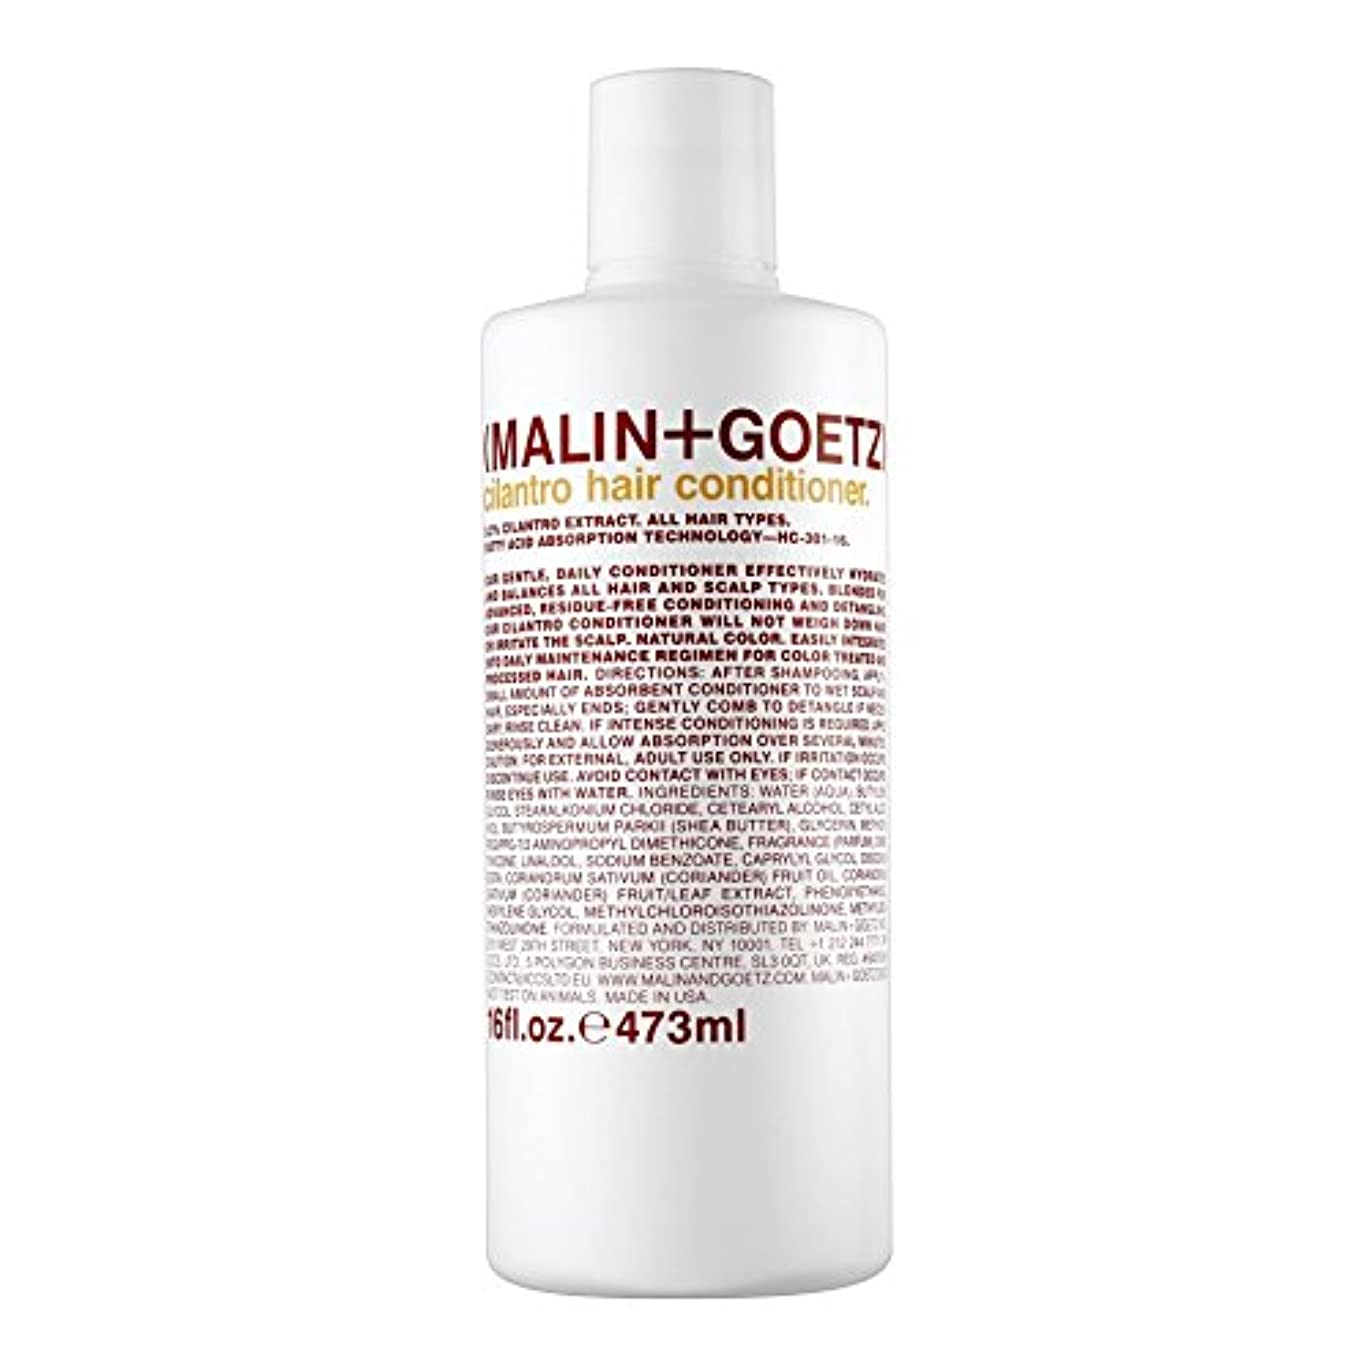 MALIN+GOETZ Cilantro Hair Conditioner 473ml - マリン+ゲッツコリアンダーのヘアコンディショナー473ミリリットル [並行輸入品]